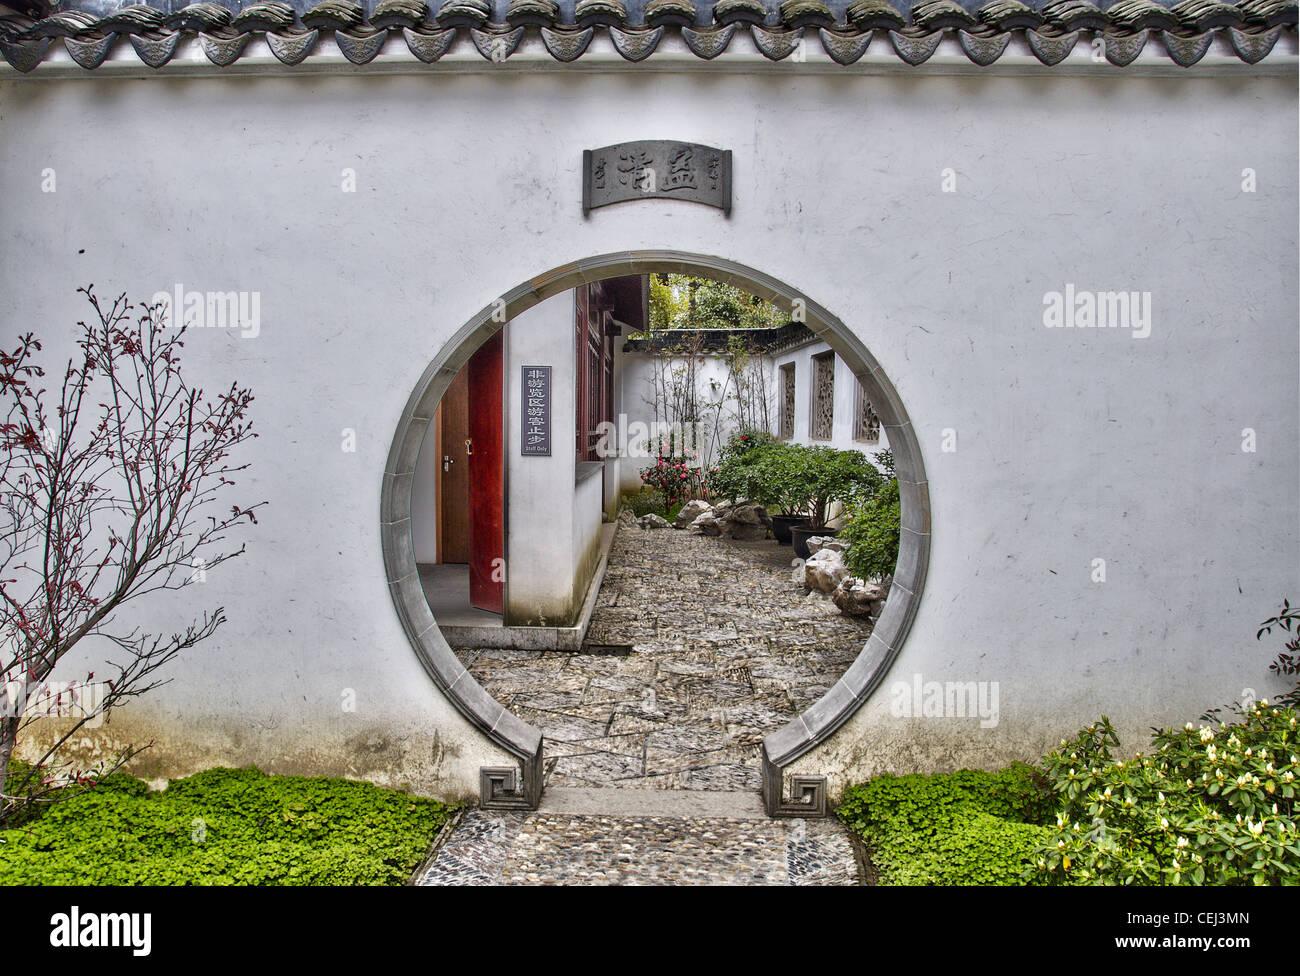 Une porte ronde à l'Humble Administrateur's garden - Suzhou (Chine) Photo Stock